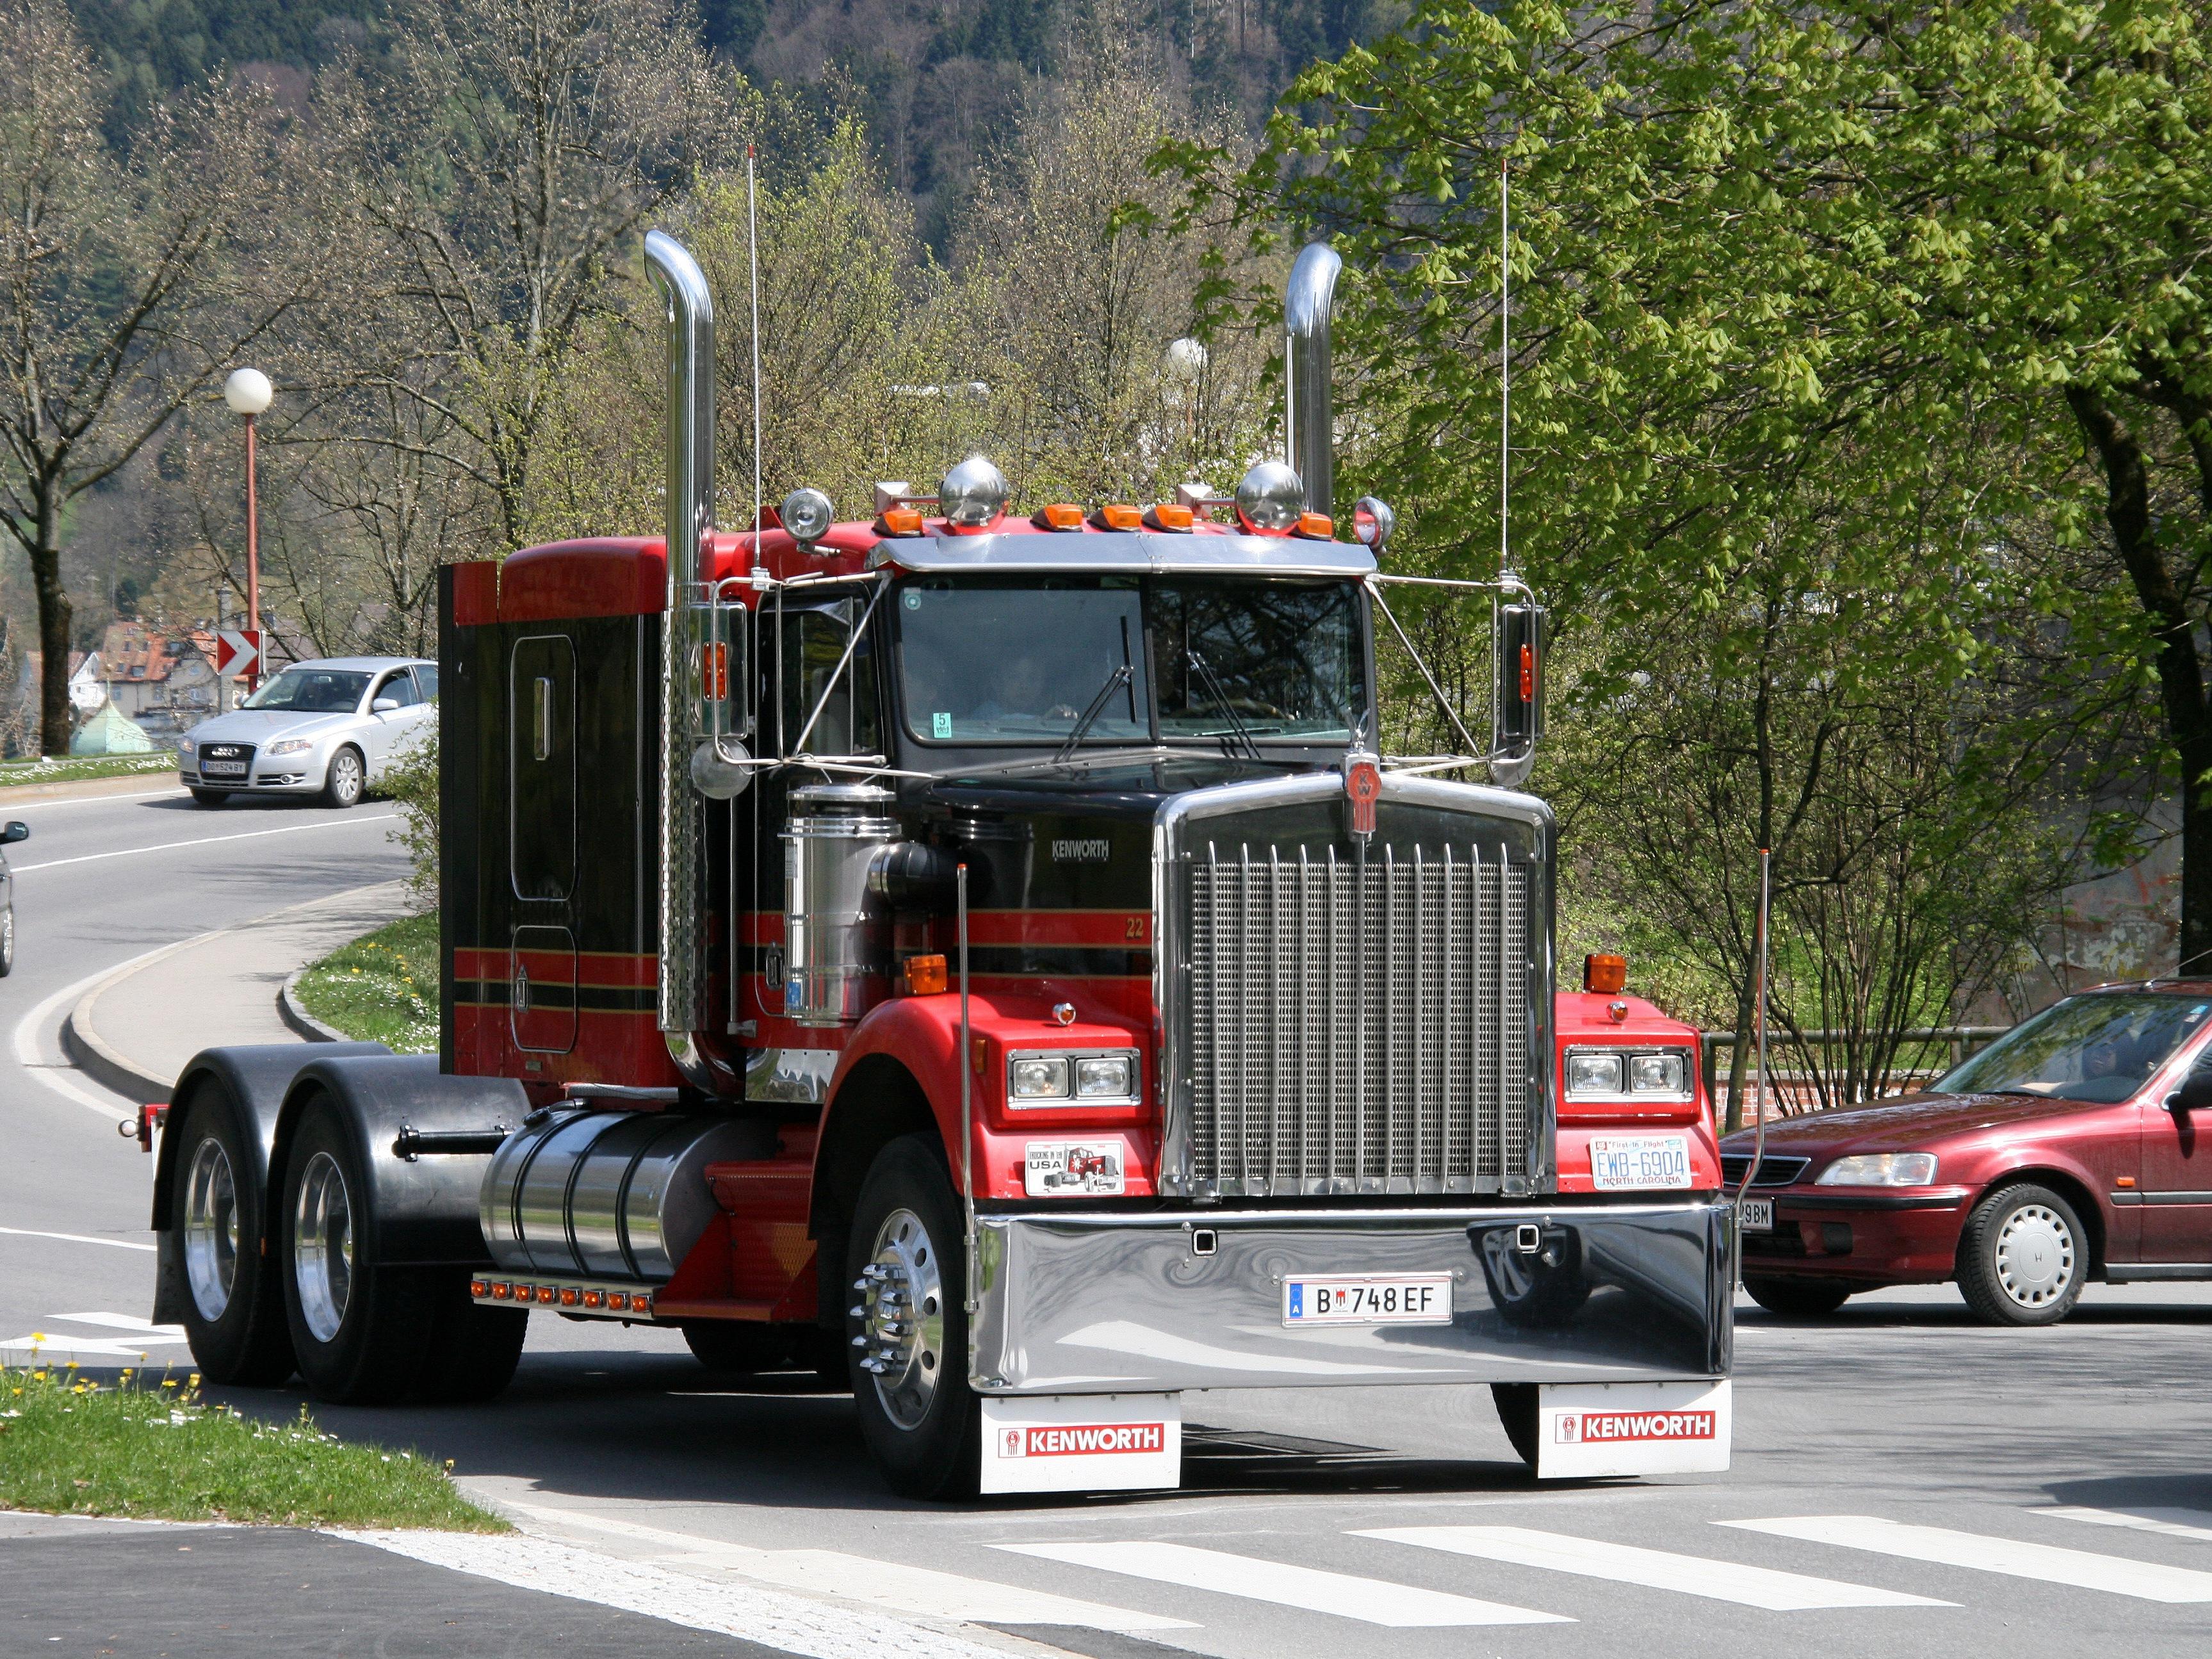 Comics Bİlder: Kenworth Trucks are one of the